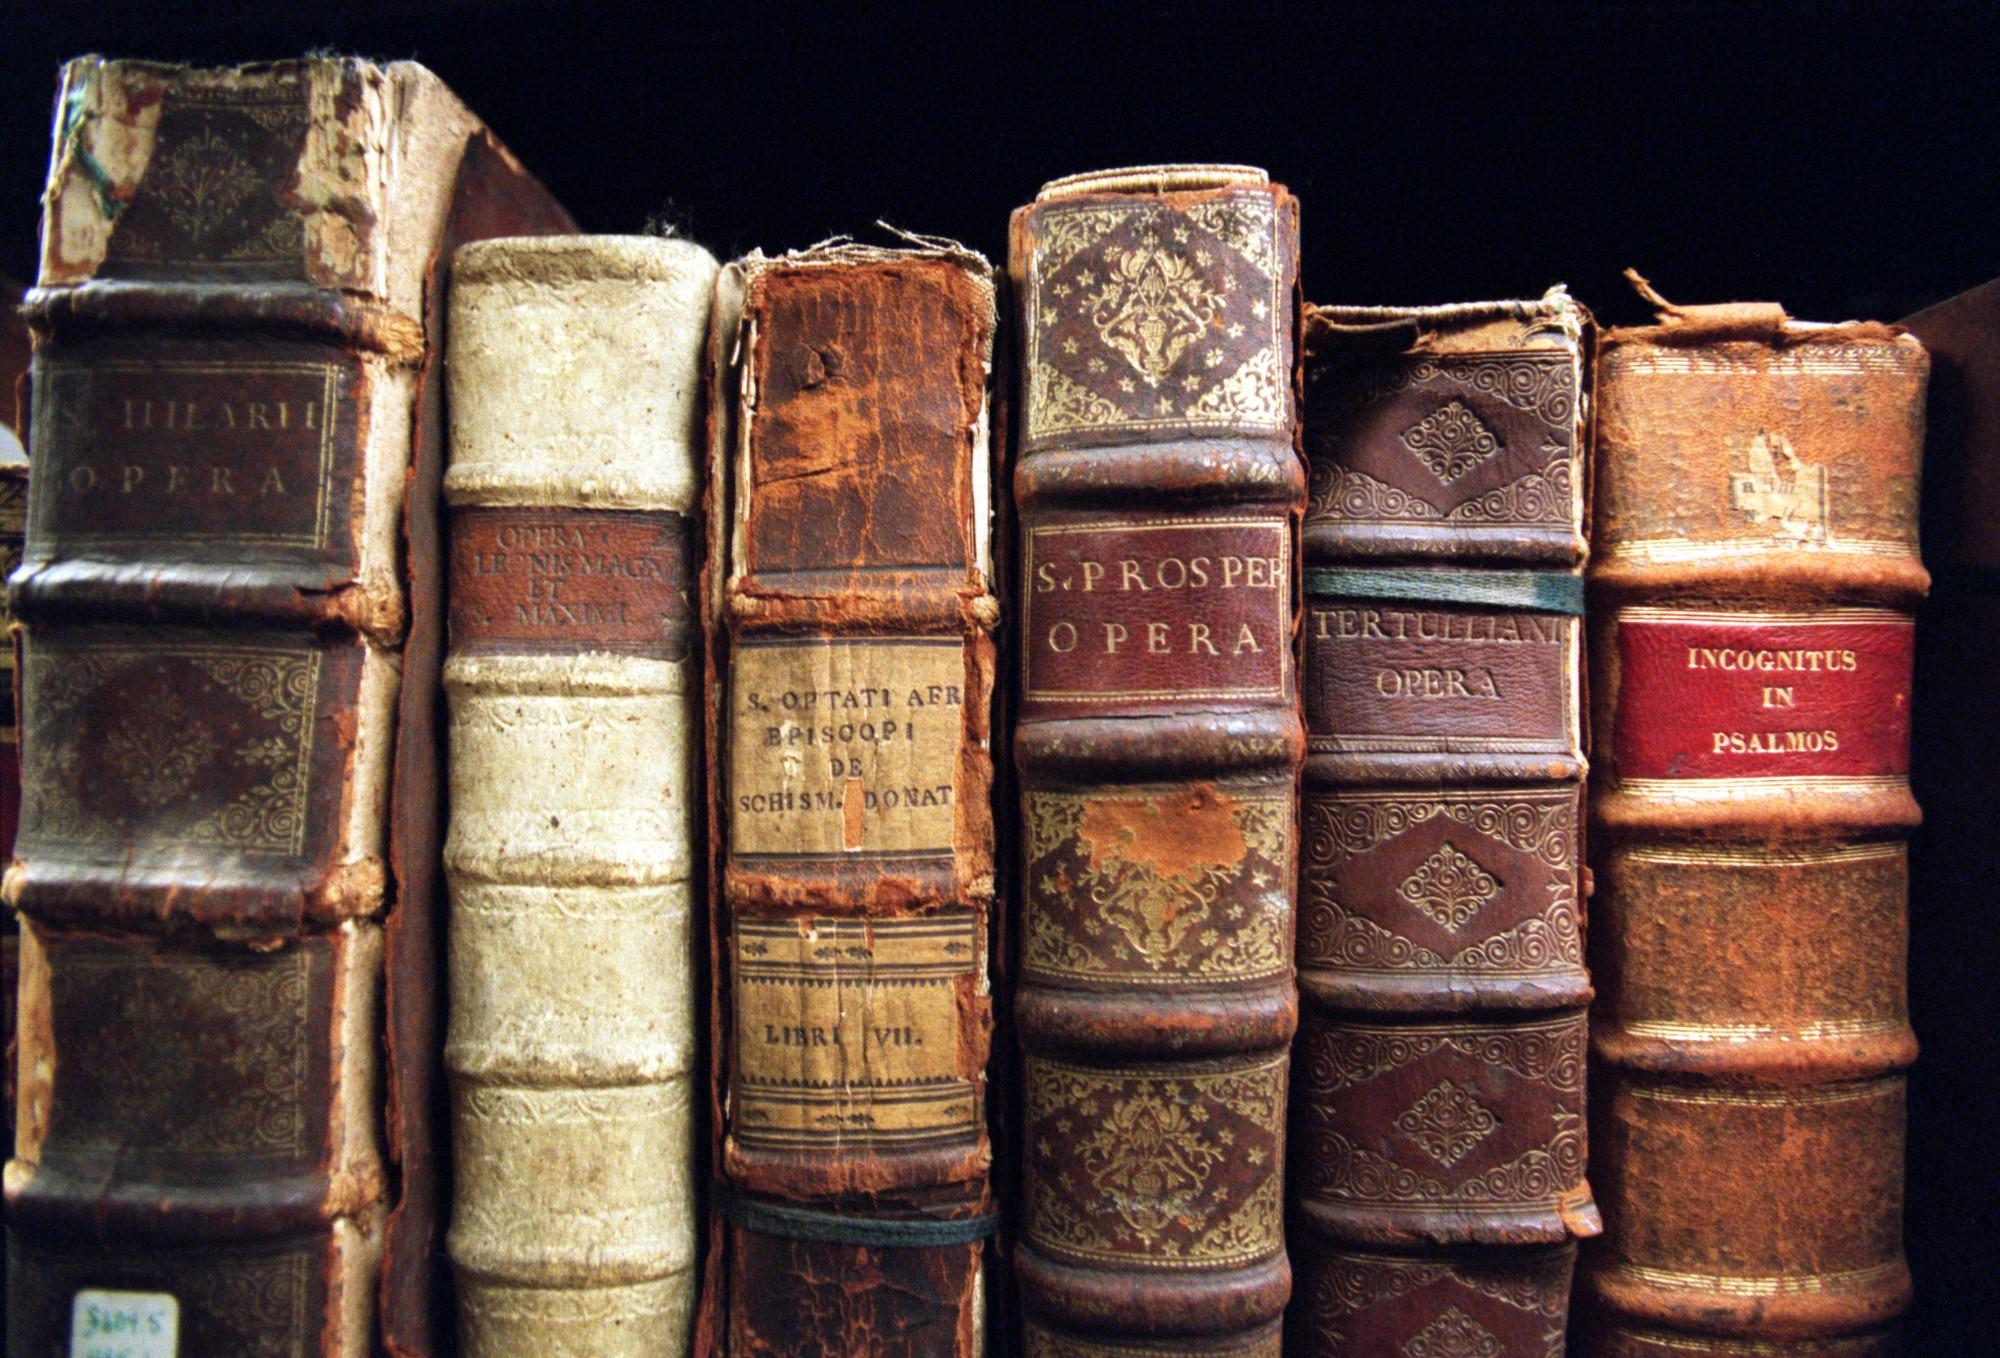 Andover-Harvard_Divinity_Library_57